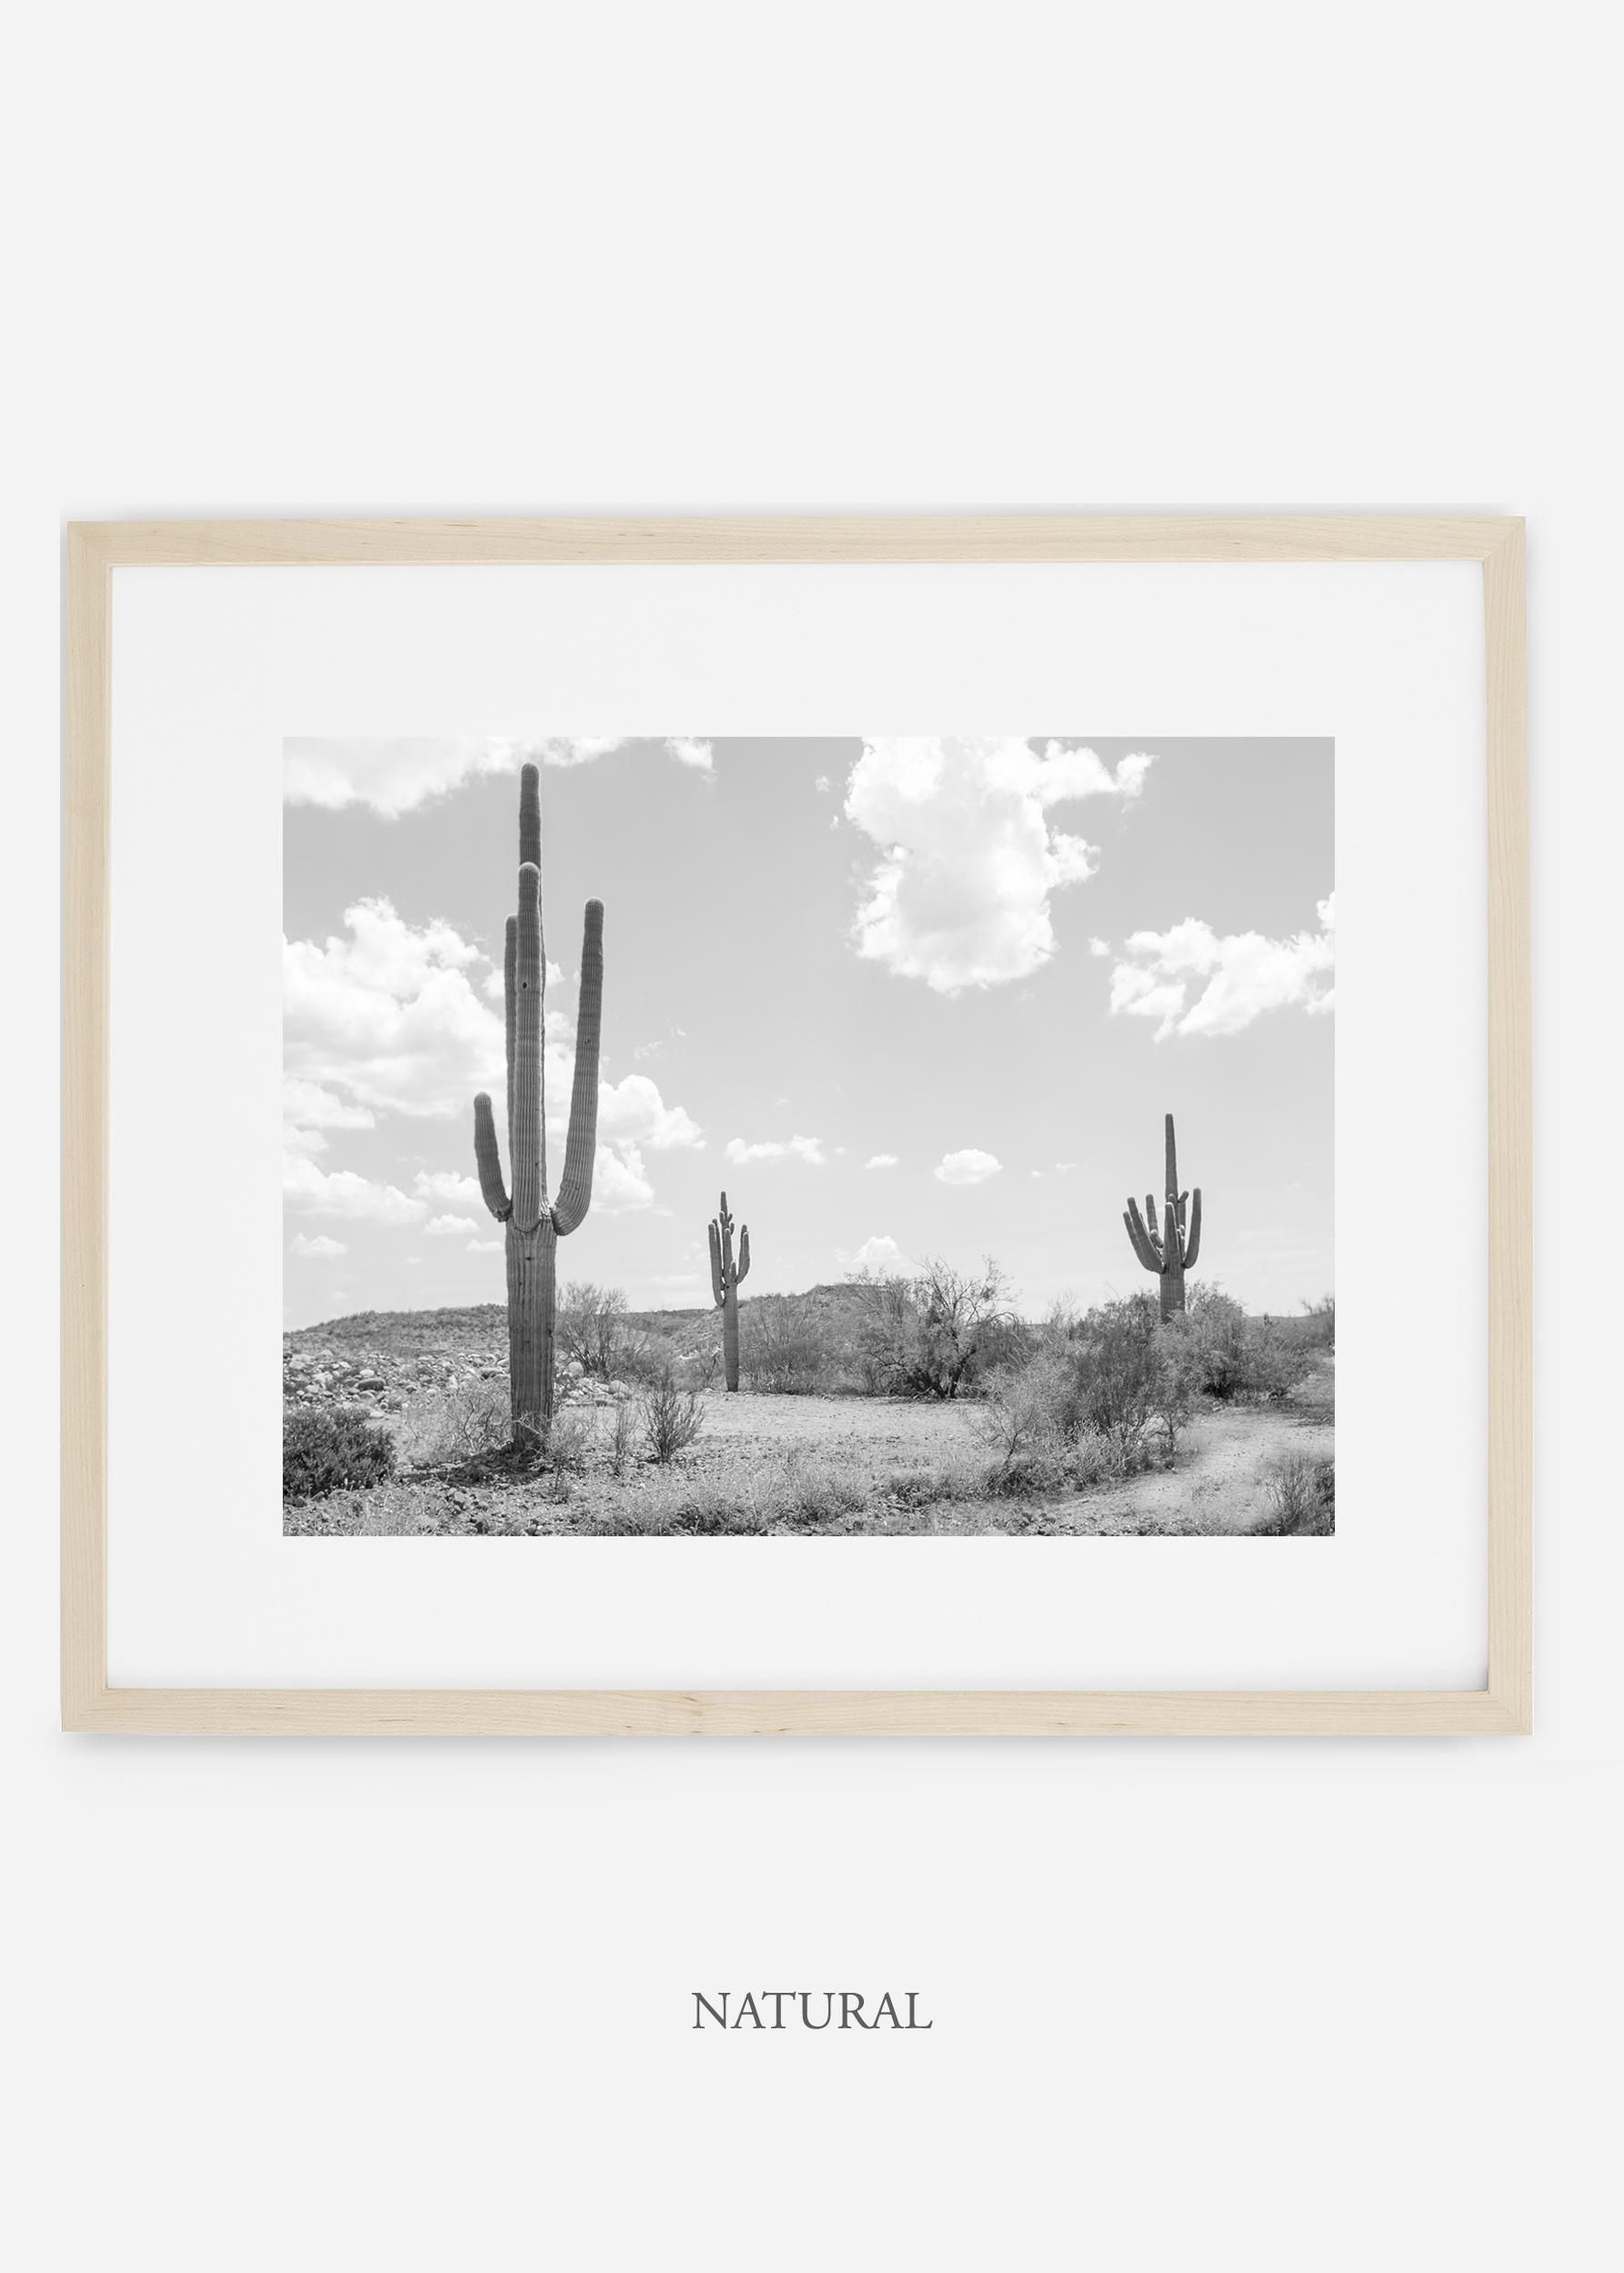 wildercalifornia_naturalframe_threesaguaro_cactus_art_interiordesign.jpg